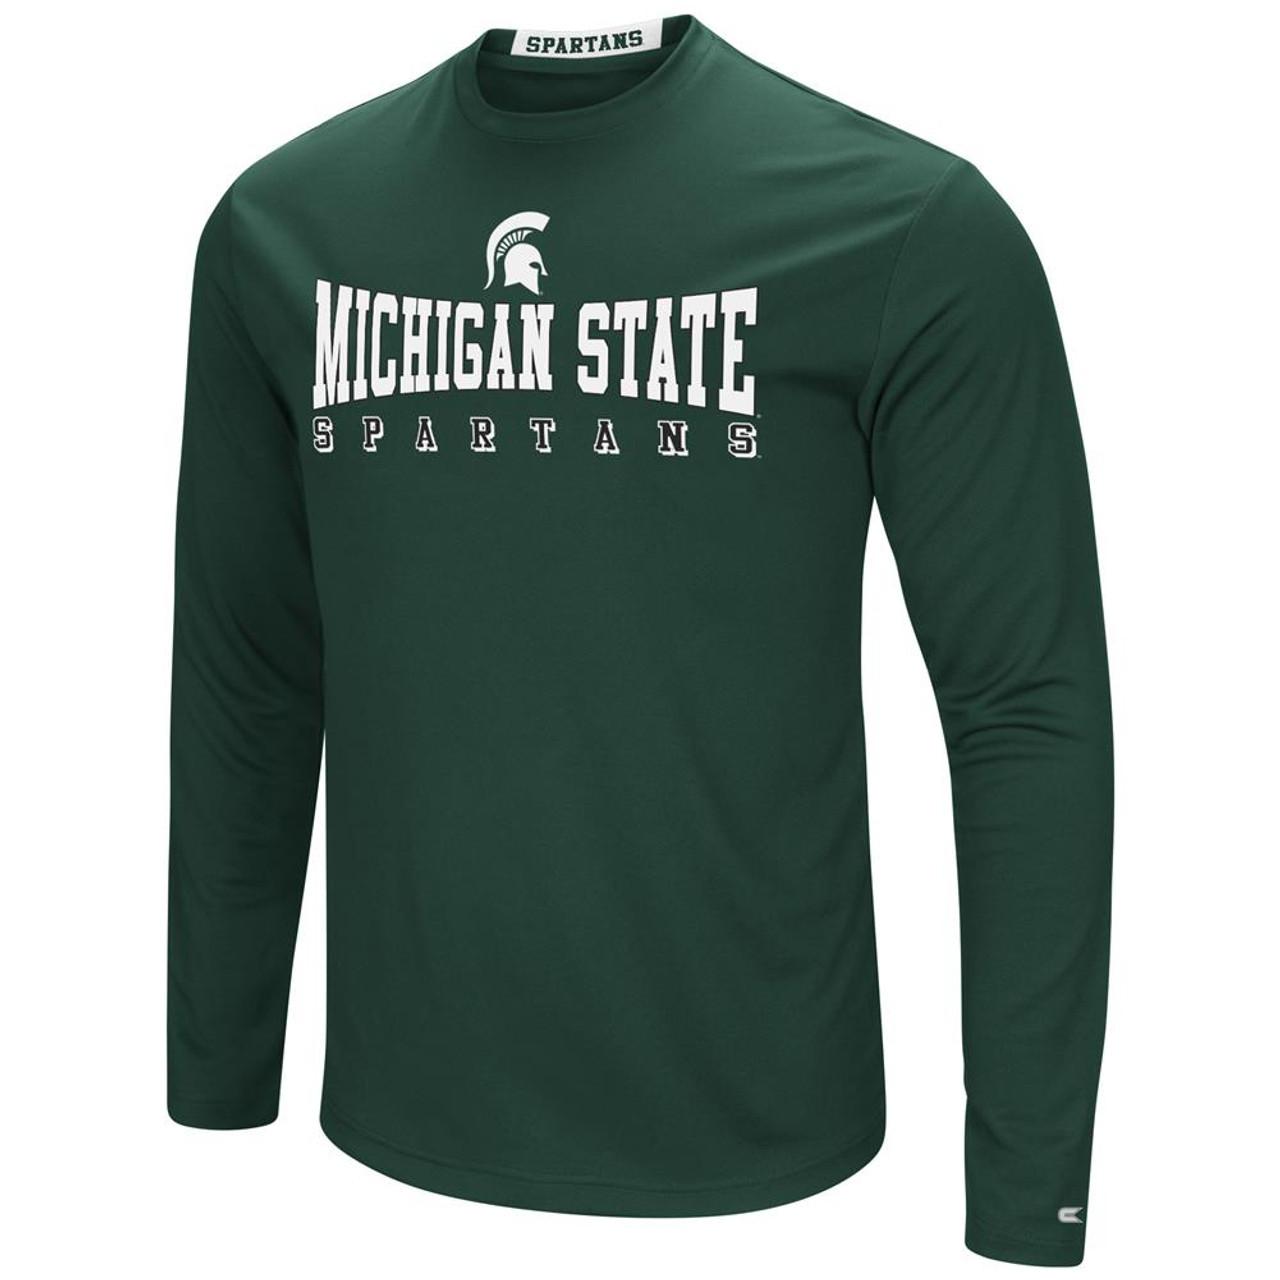 Michigan State University T-Shirt Performance Long Sleeve Shirt